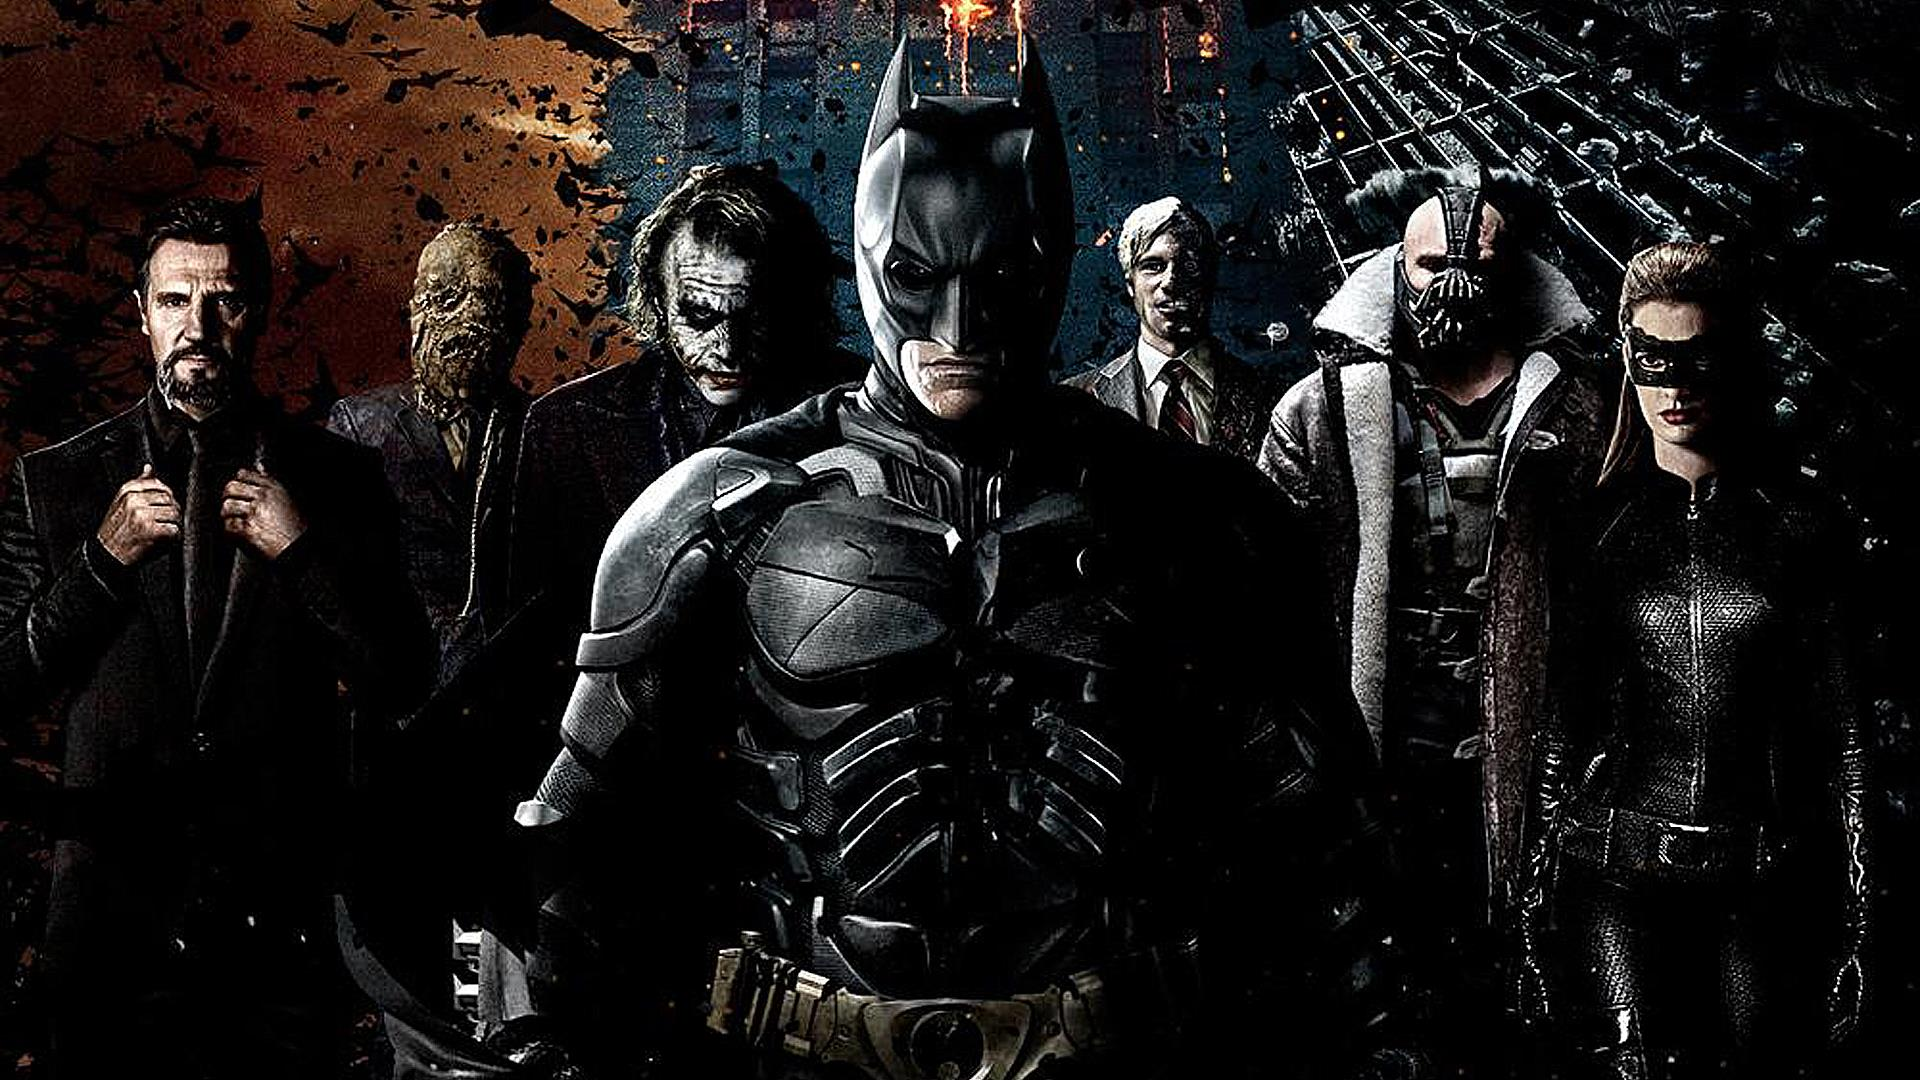 Batman HD Wallpapers for Desktop (21)